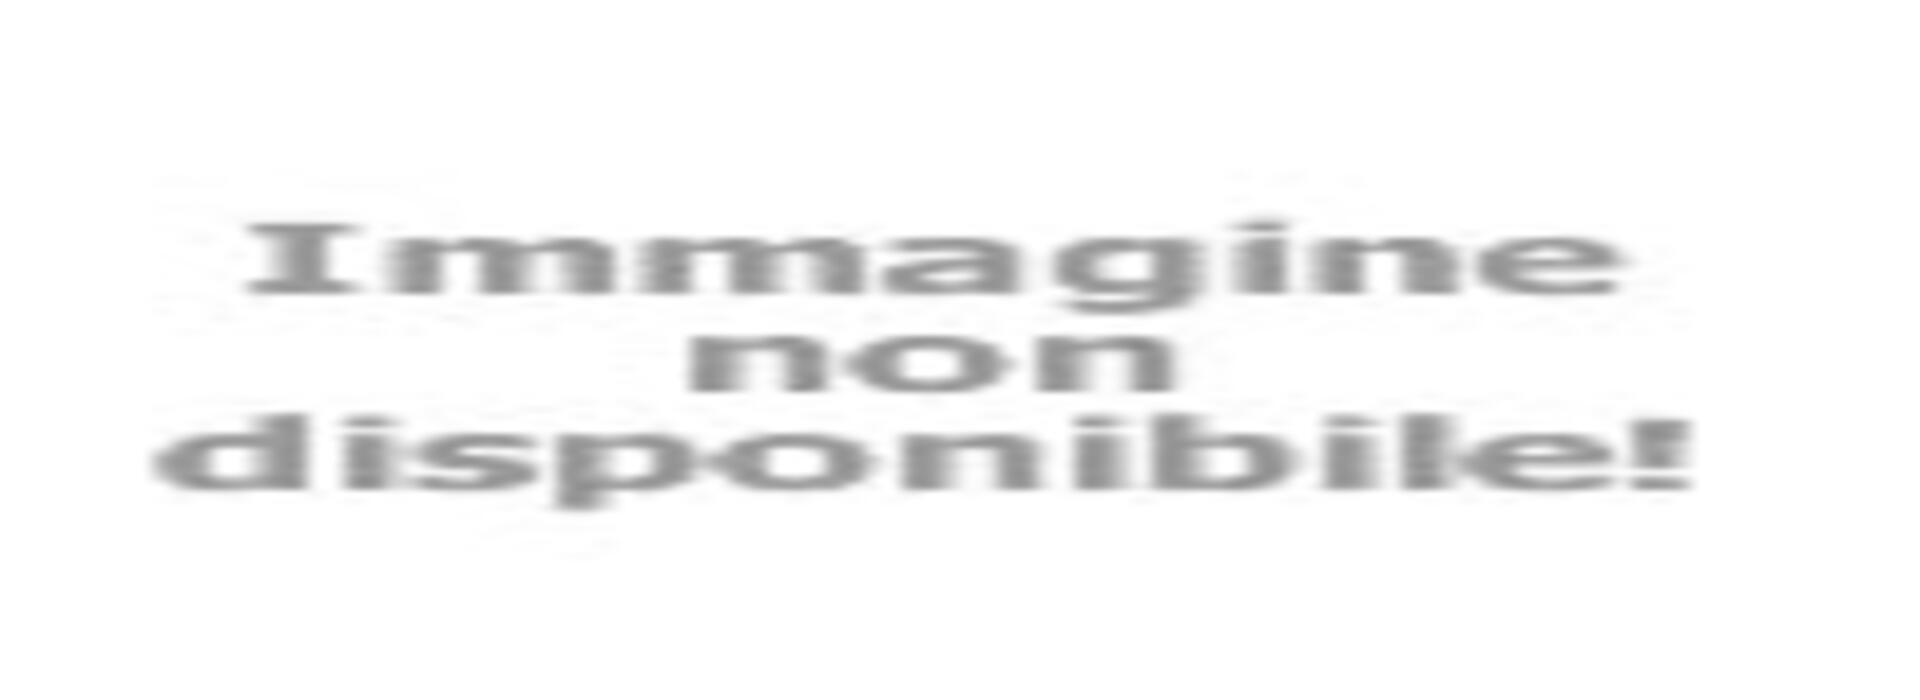 hotel-montecarlo it hotel-montecarlo-awards 019